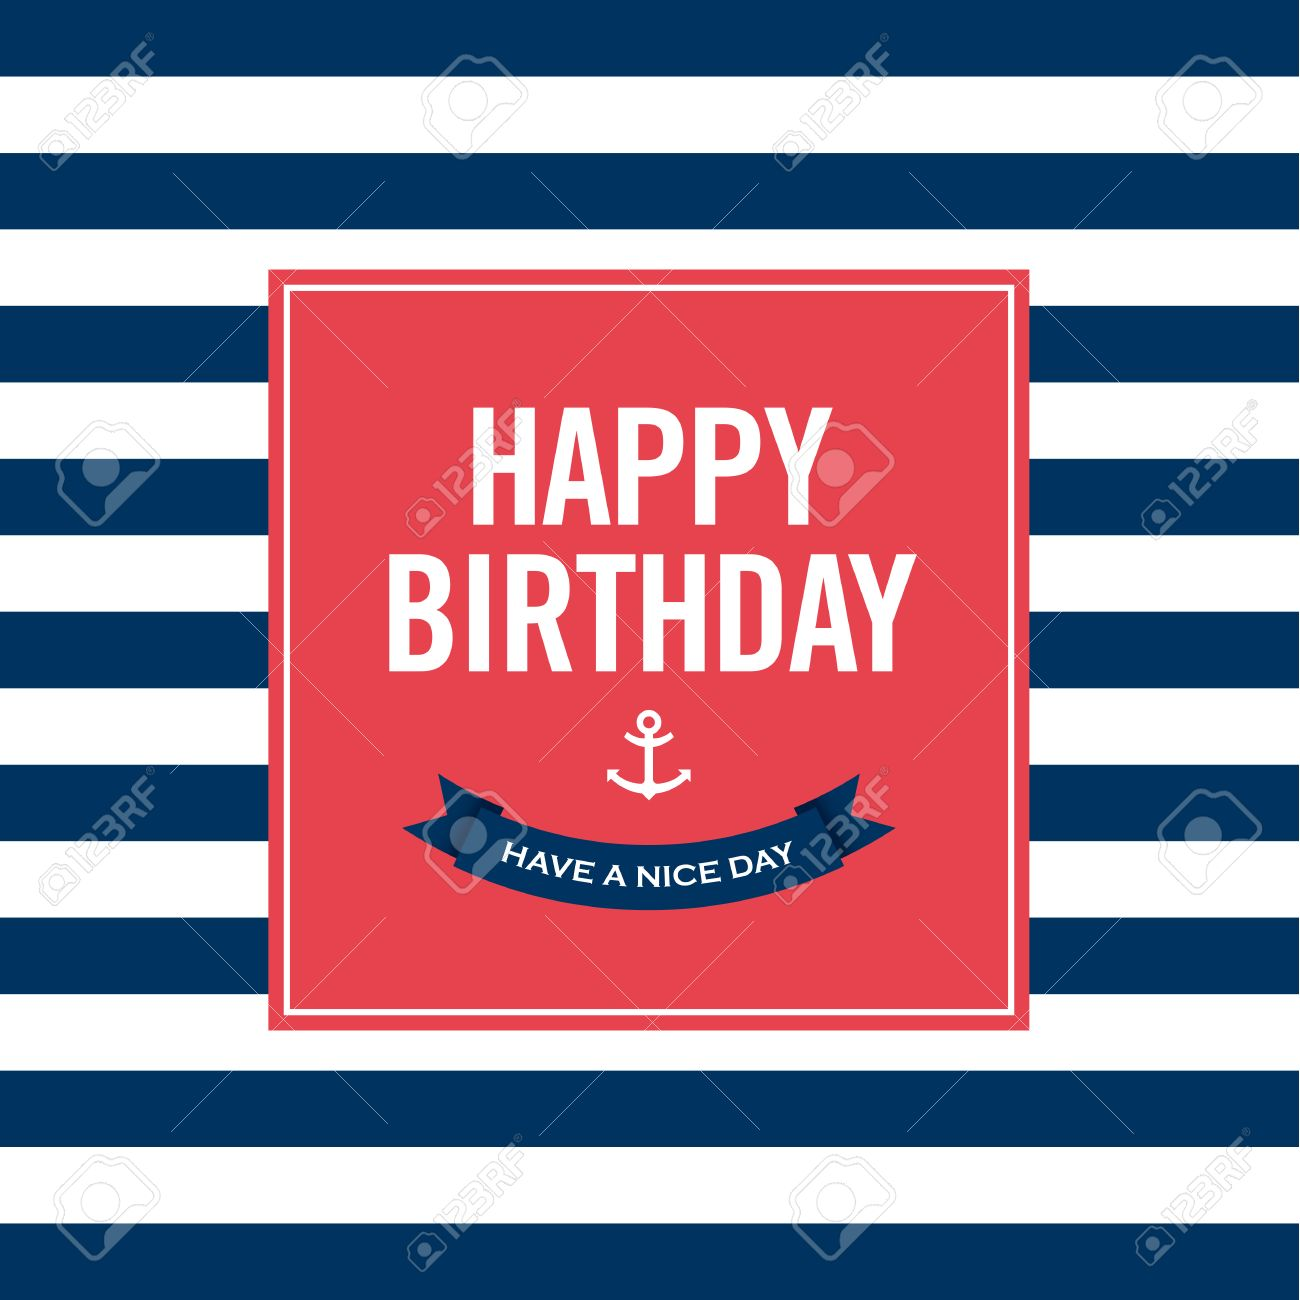 Happy birthday invitation card  Sailor theme  Text and color editable Stock Vector - 22497732